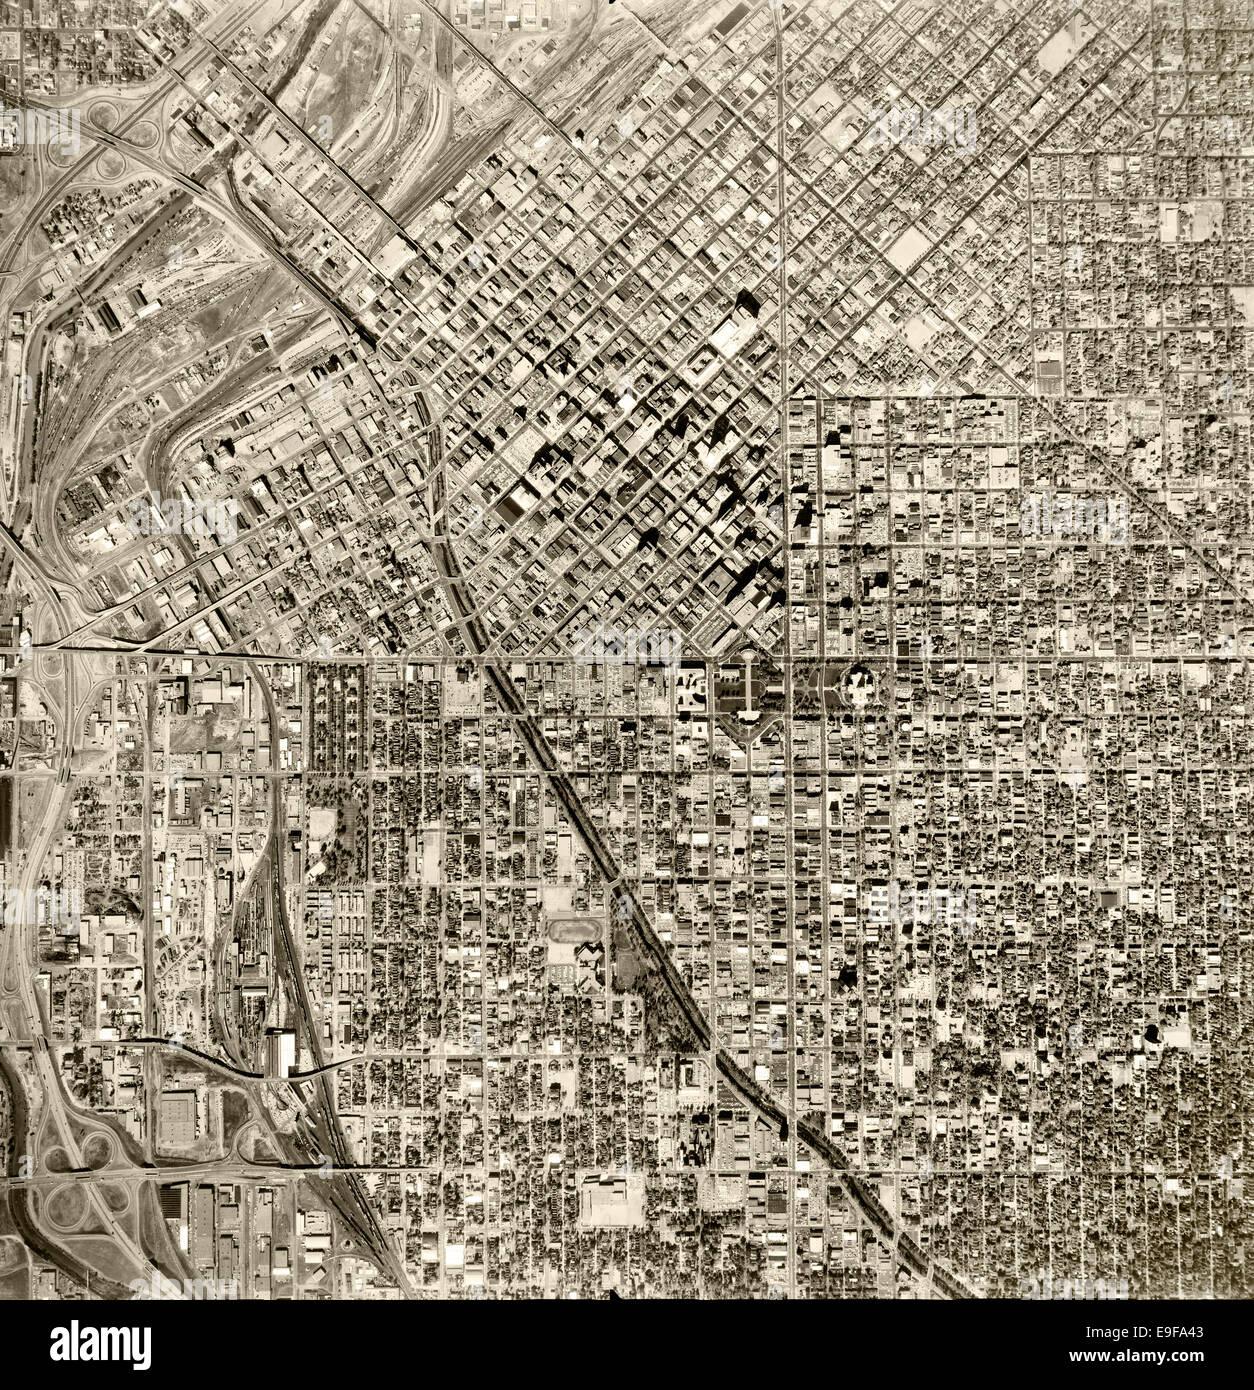 historical aerial photograph Denver, Colorado, 1964 - Stock Image